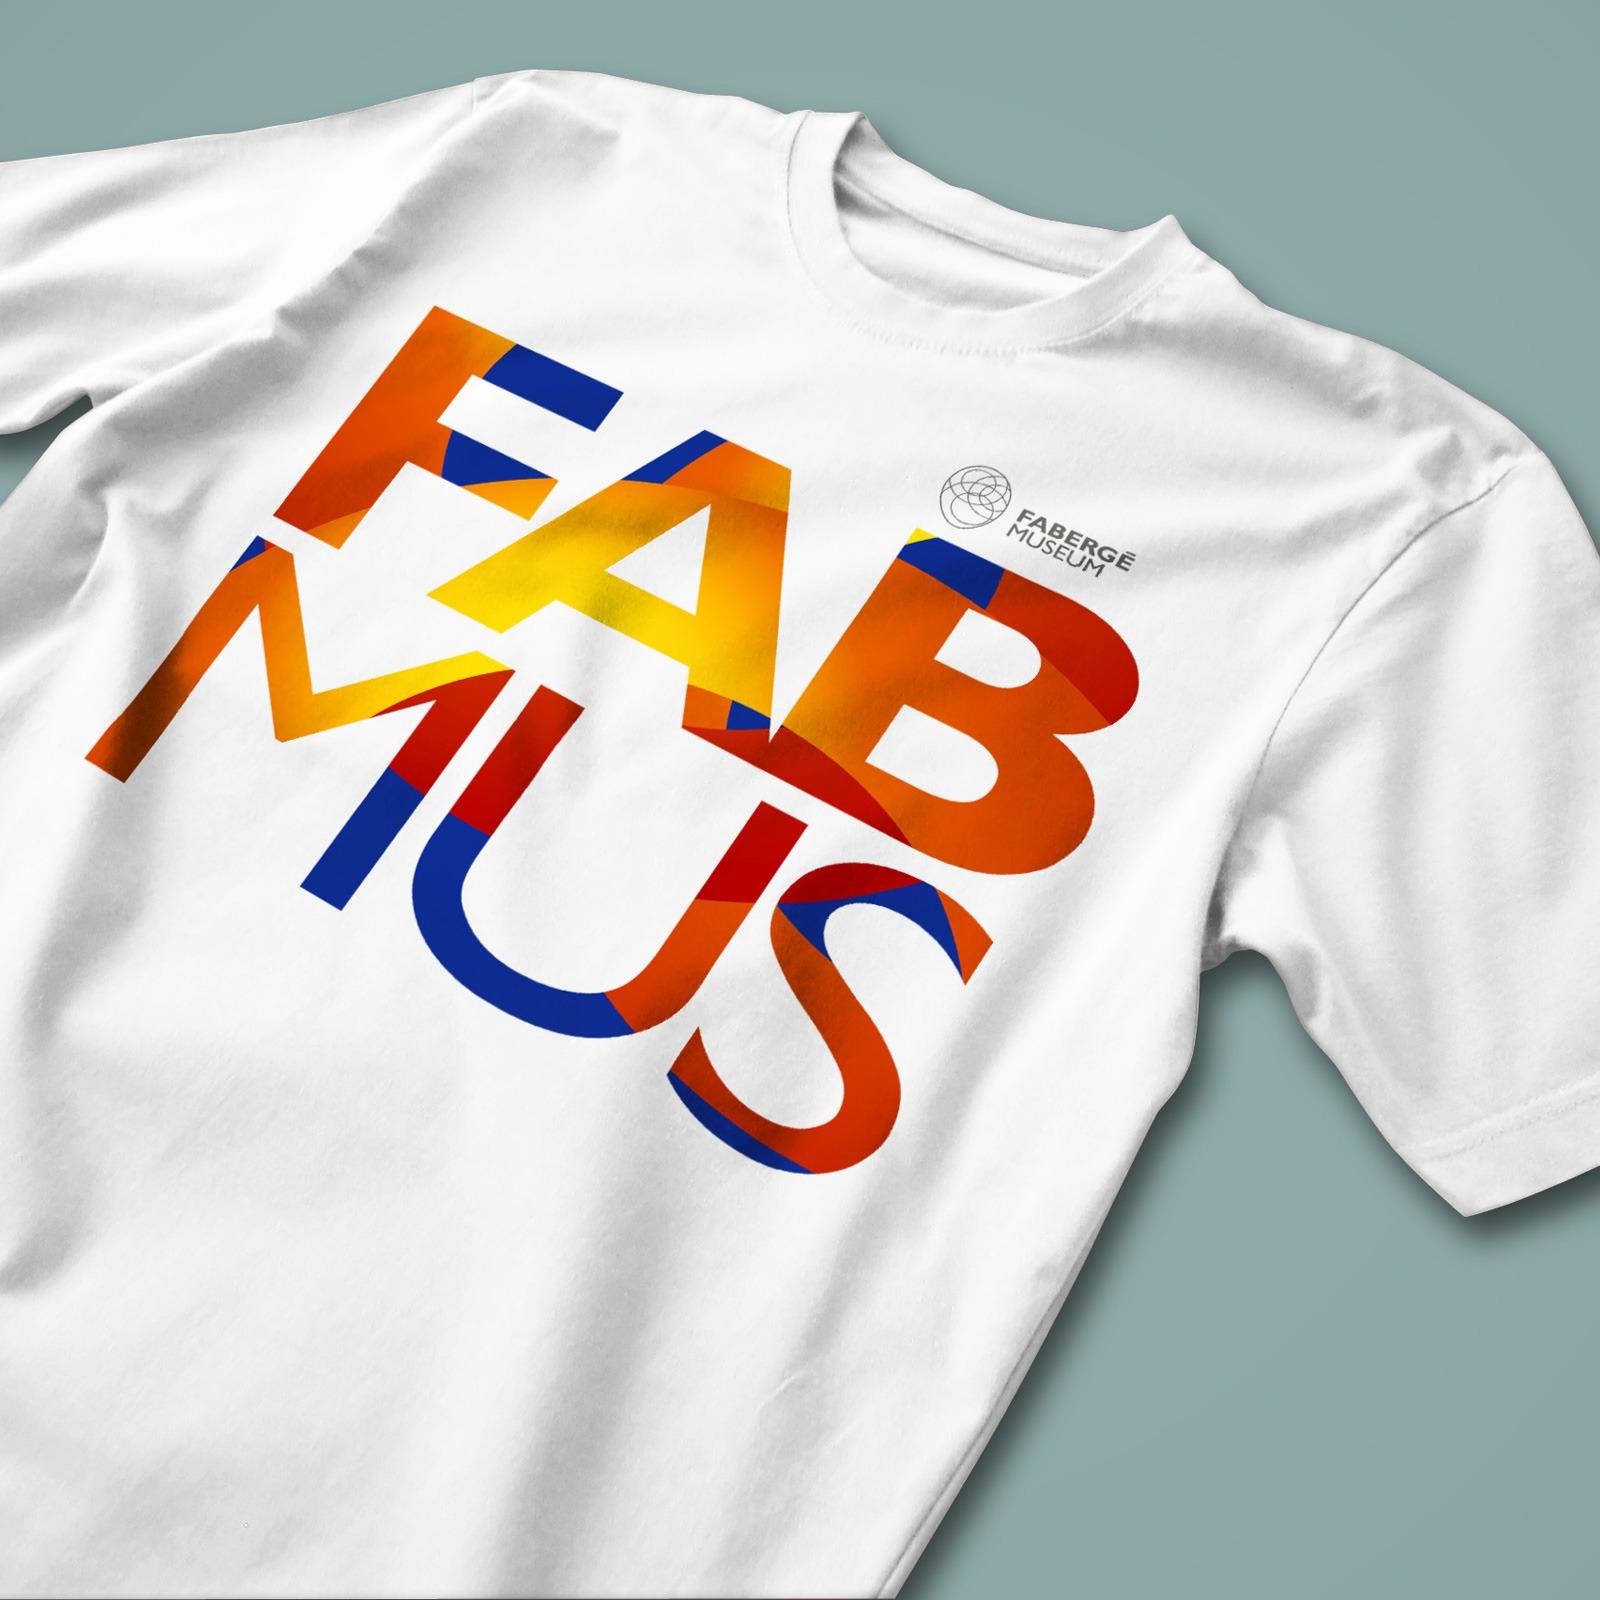 Asgard Branding, брендинг, Музей Фаберже, сувенирная майка, футболка, T-shirt Fab Mus